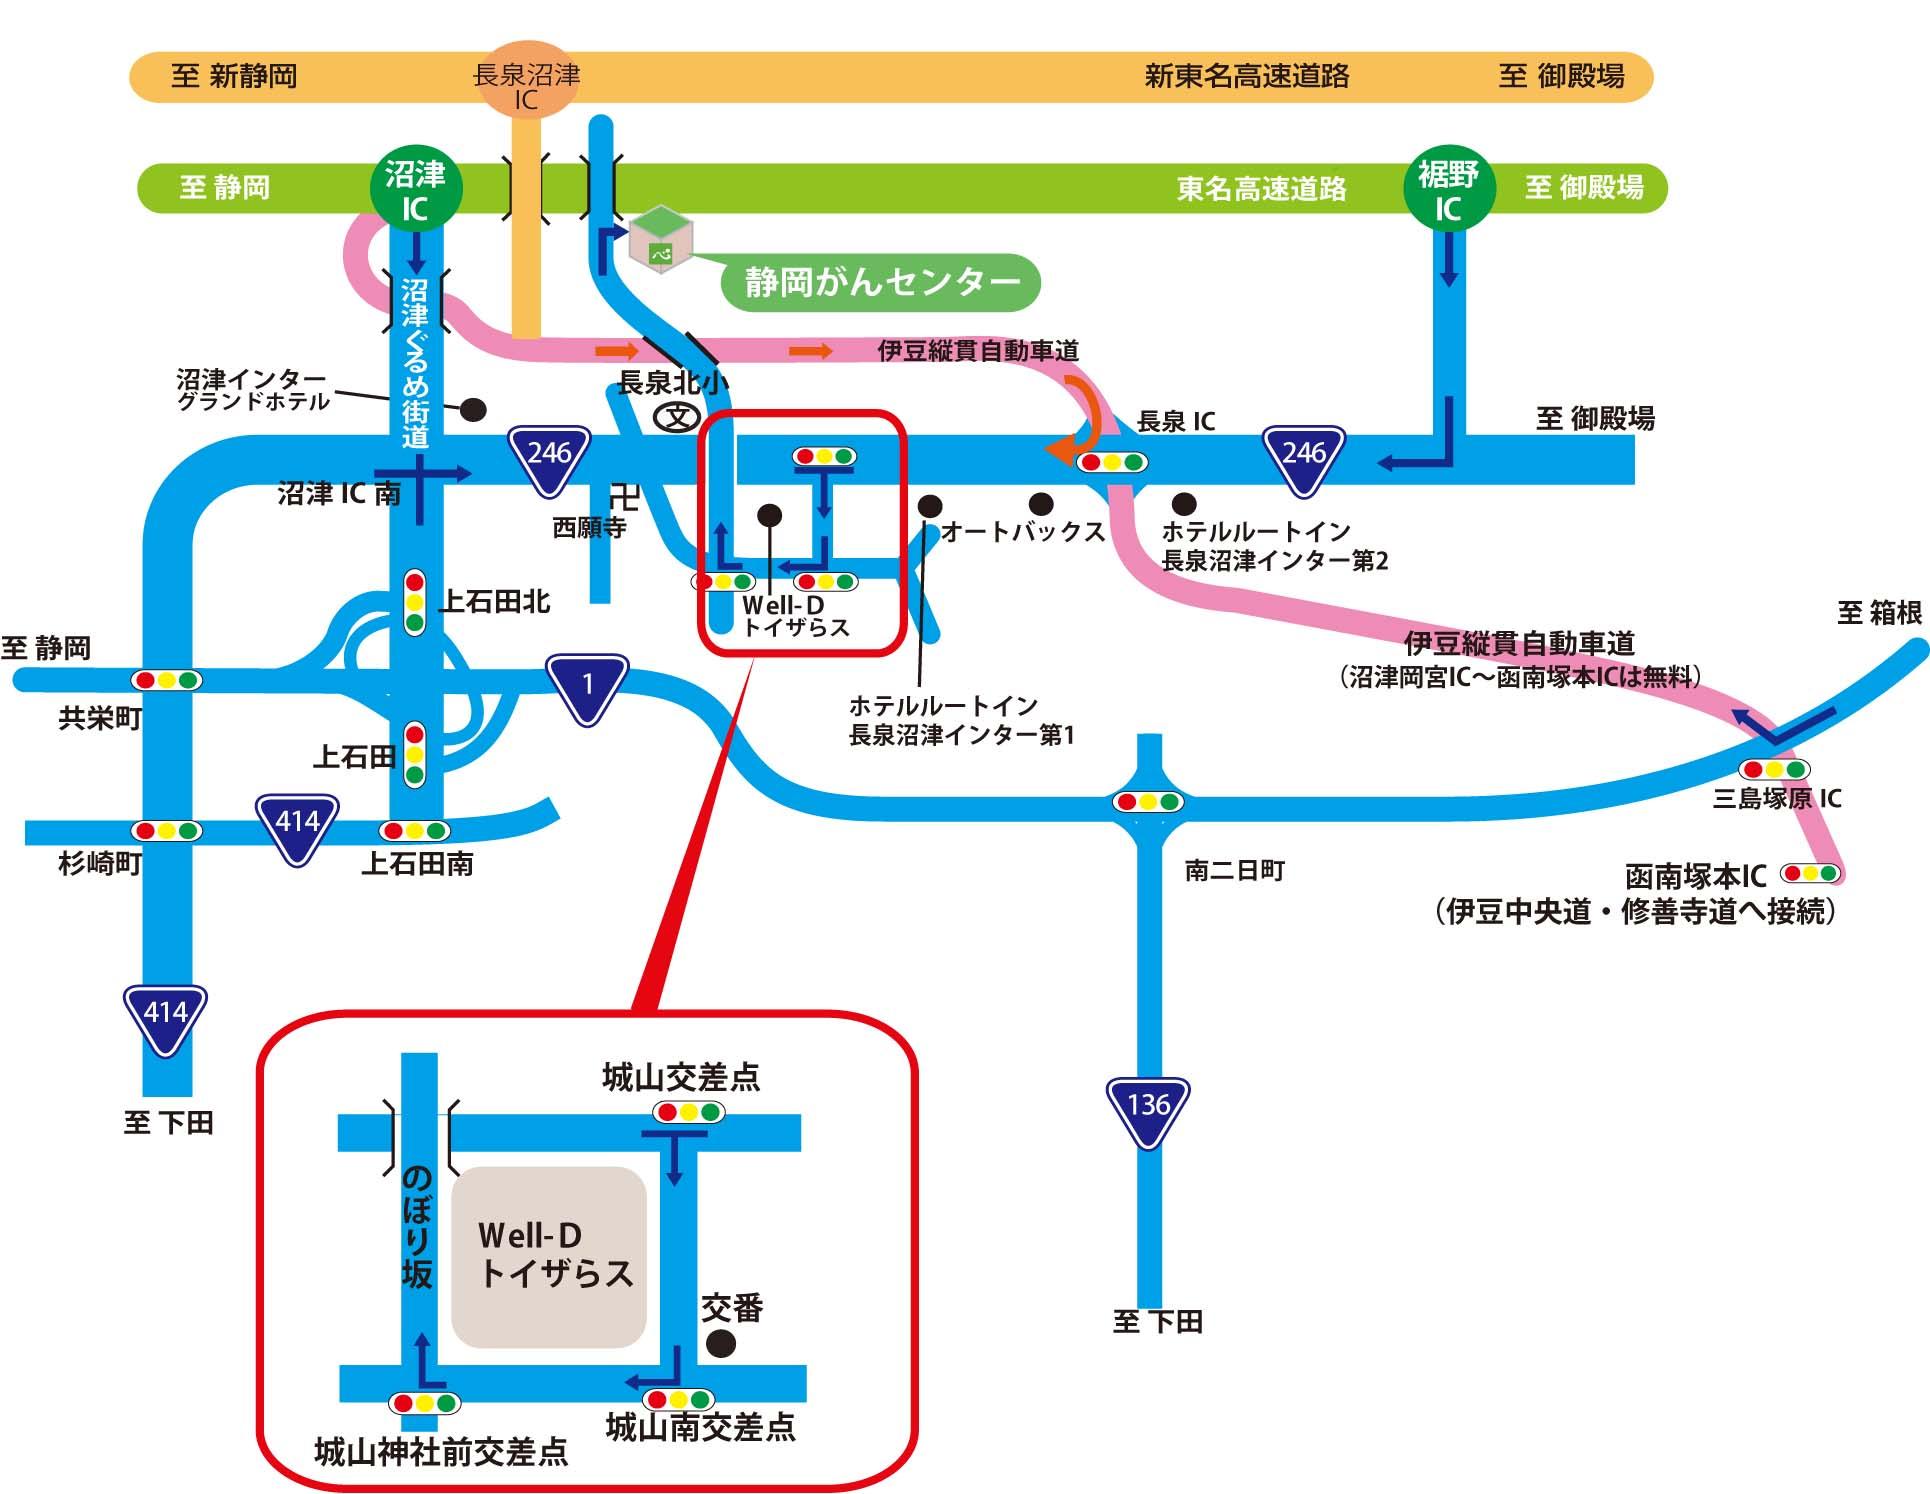 ●20170816 SCCへの交通アクセス(詳細版)